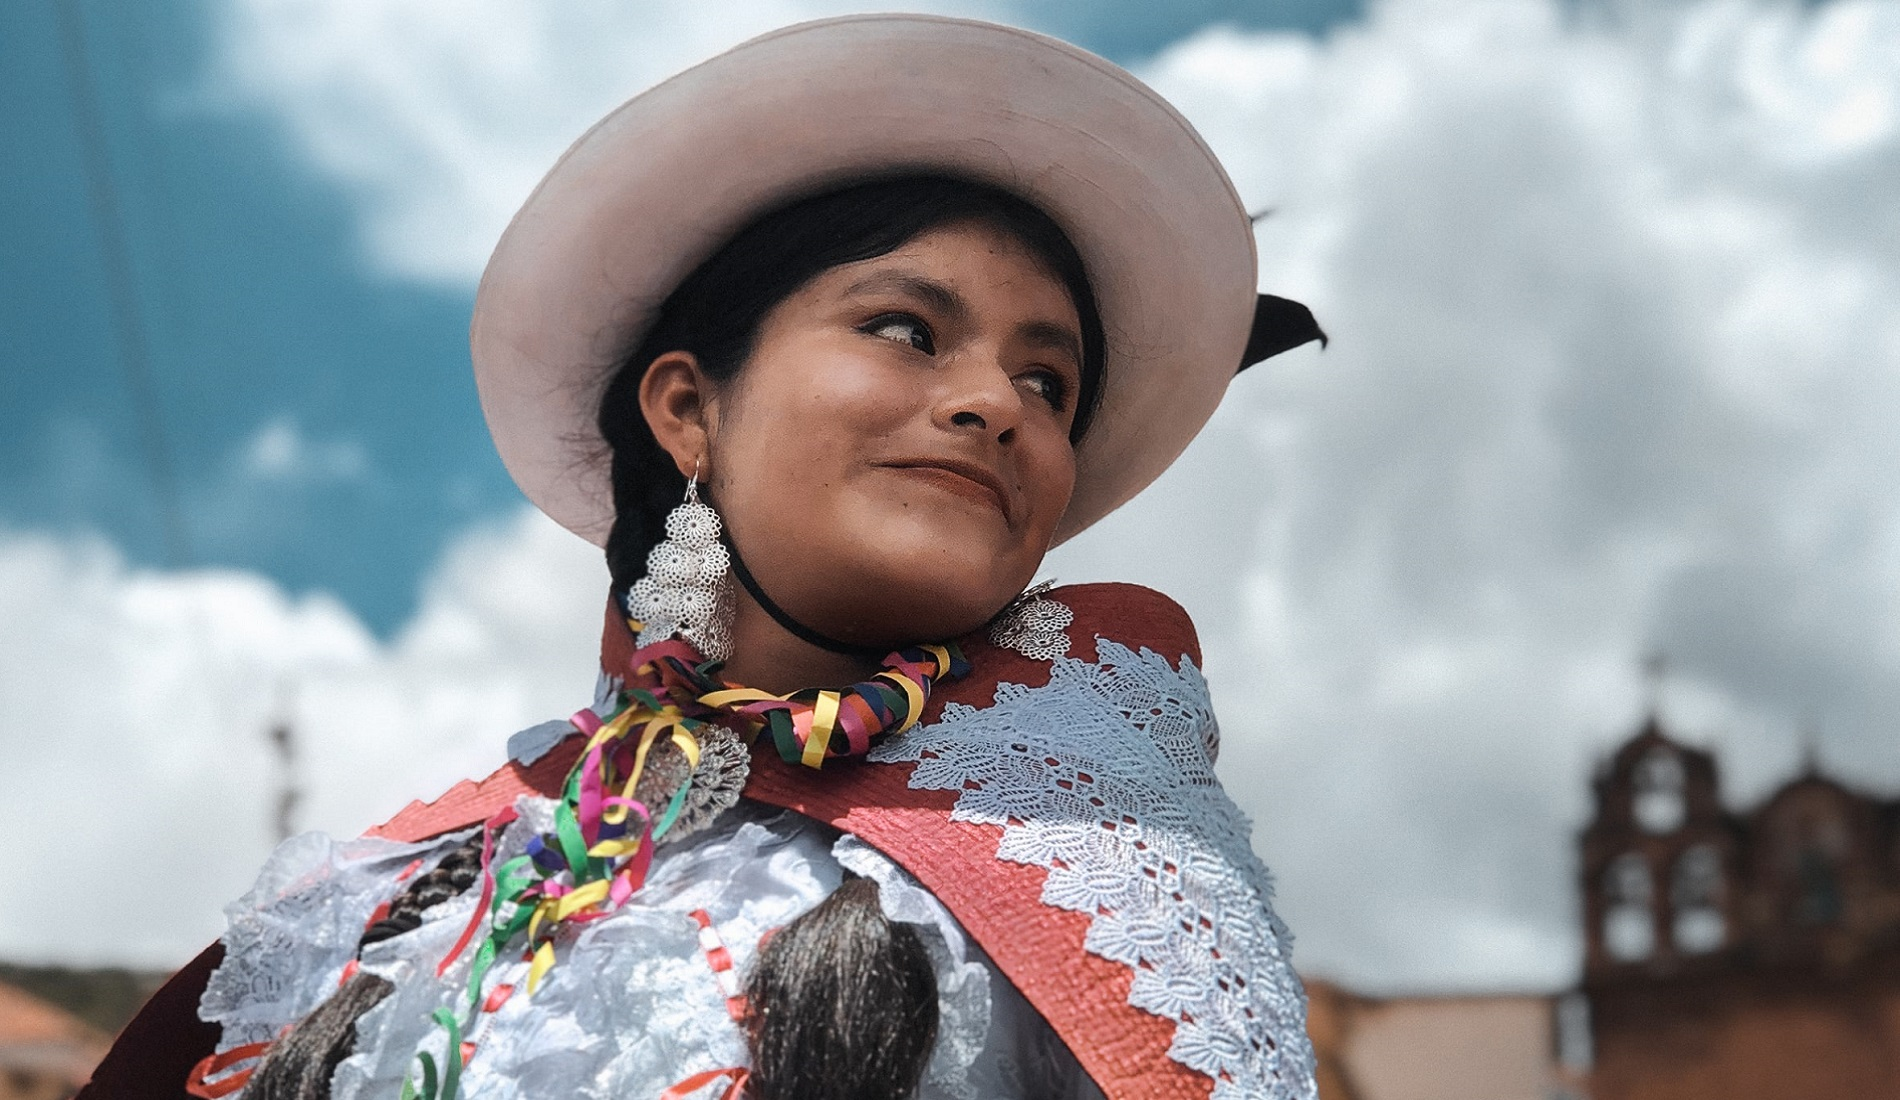 Luxe Reis Peru local